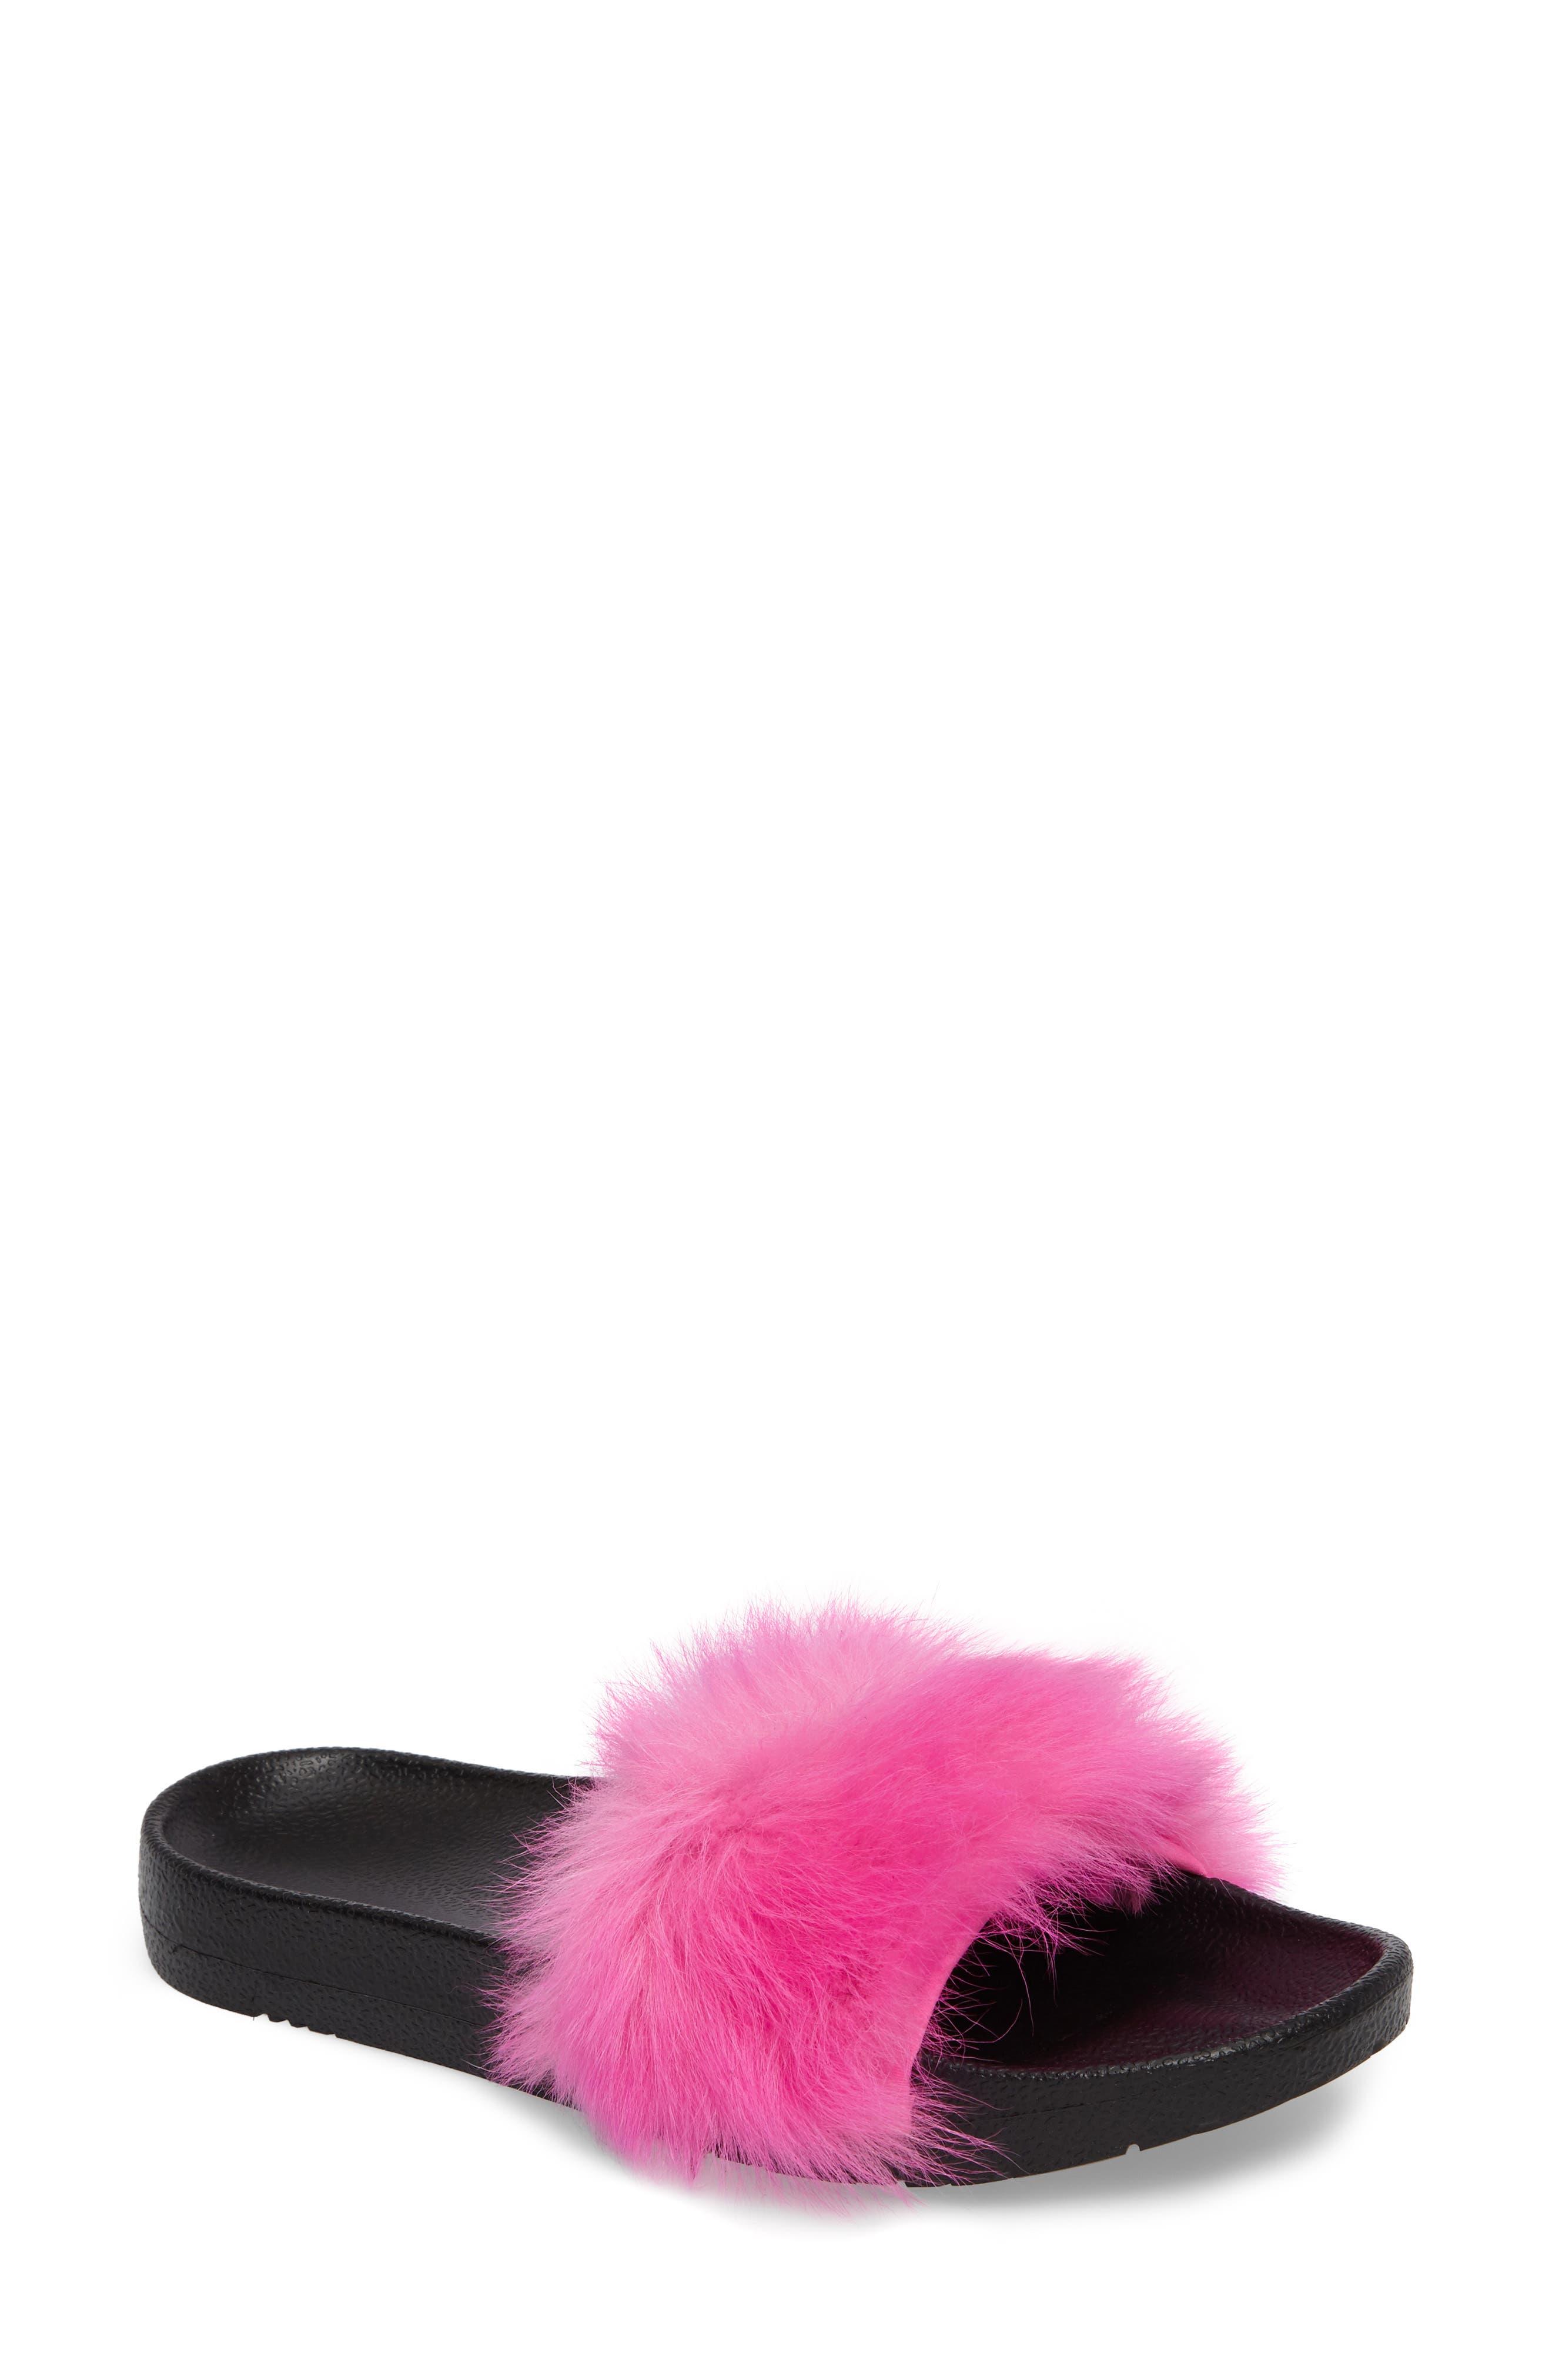 Alternate Image 1 Selected - UGG® Royale Genuine Shearling Slide Sandal (Women)